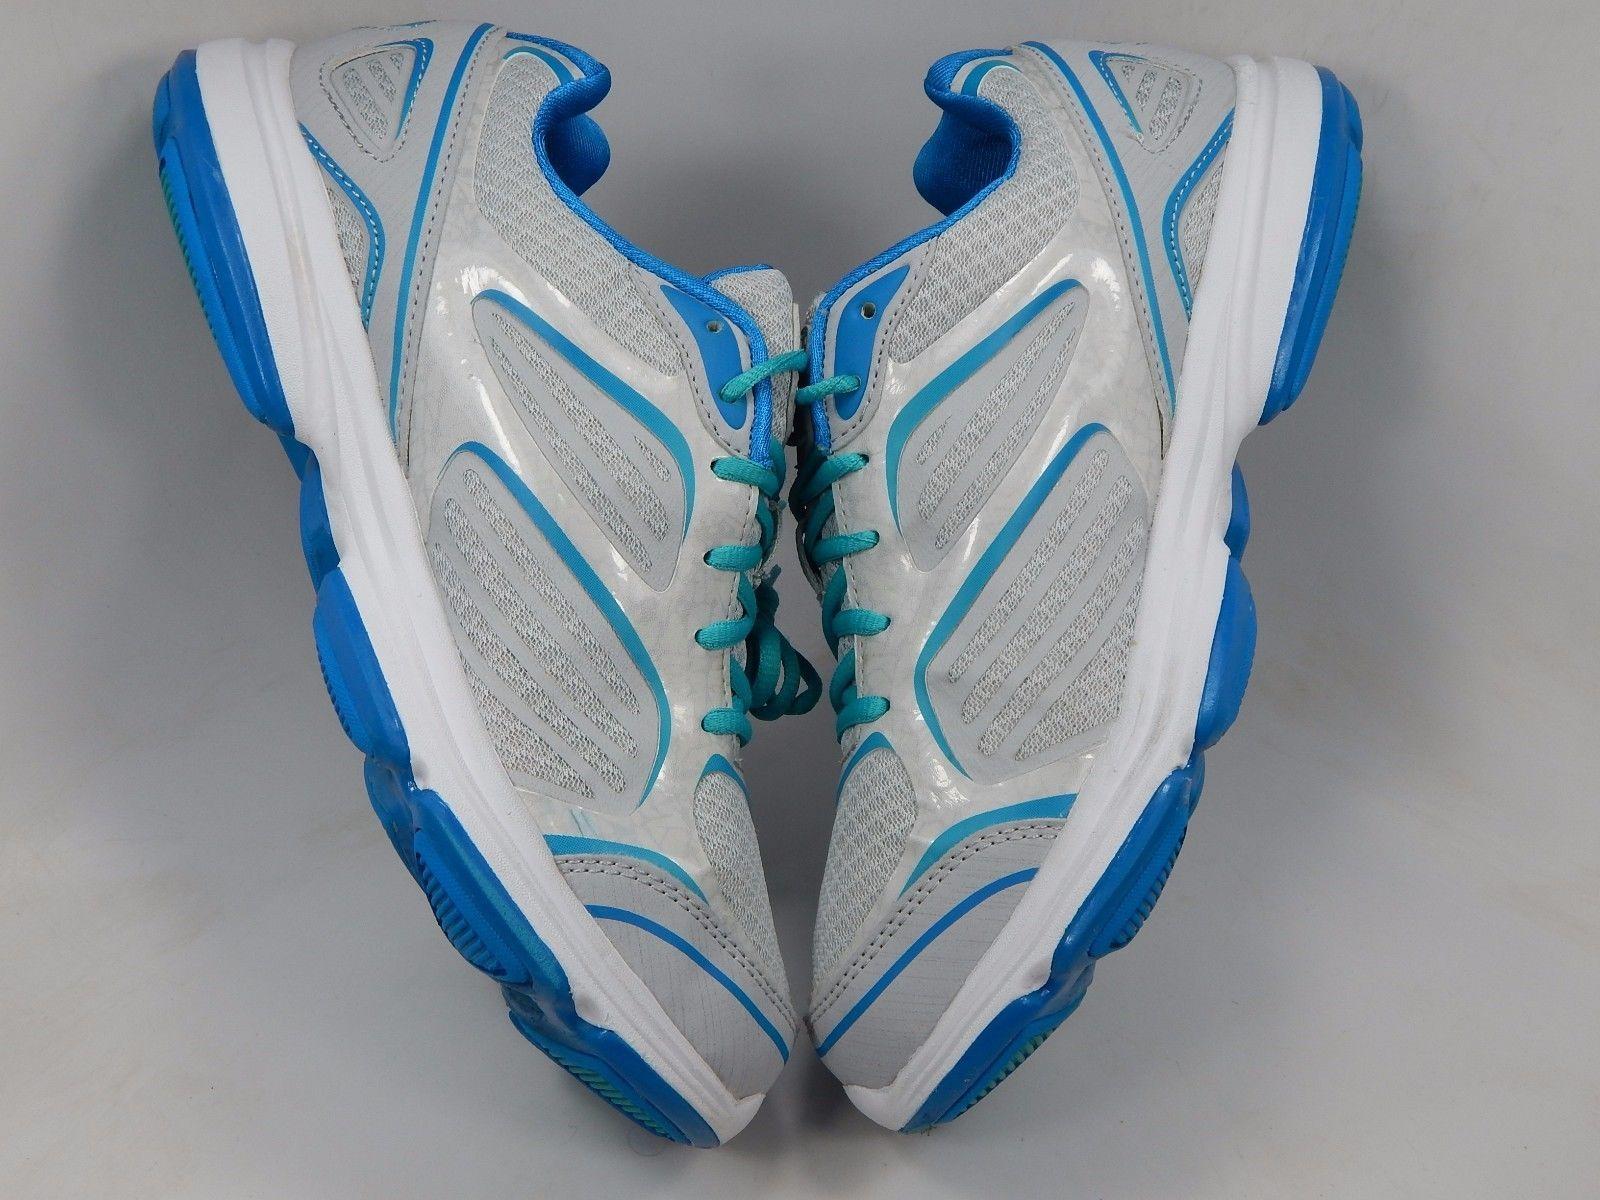 Ryka Devo Plus Women's Running Shoes Size US 8.5 M (B) EU 39.5 Silver Blue